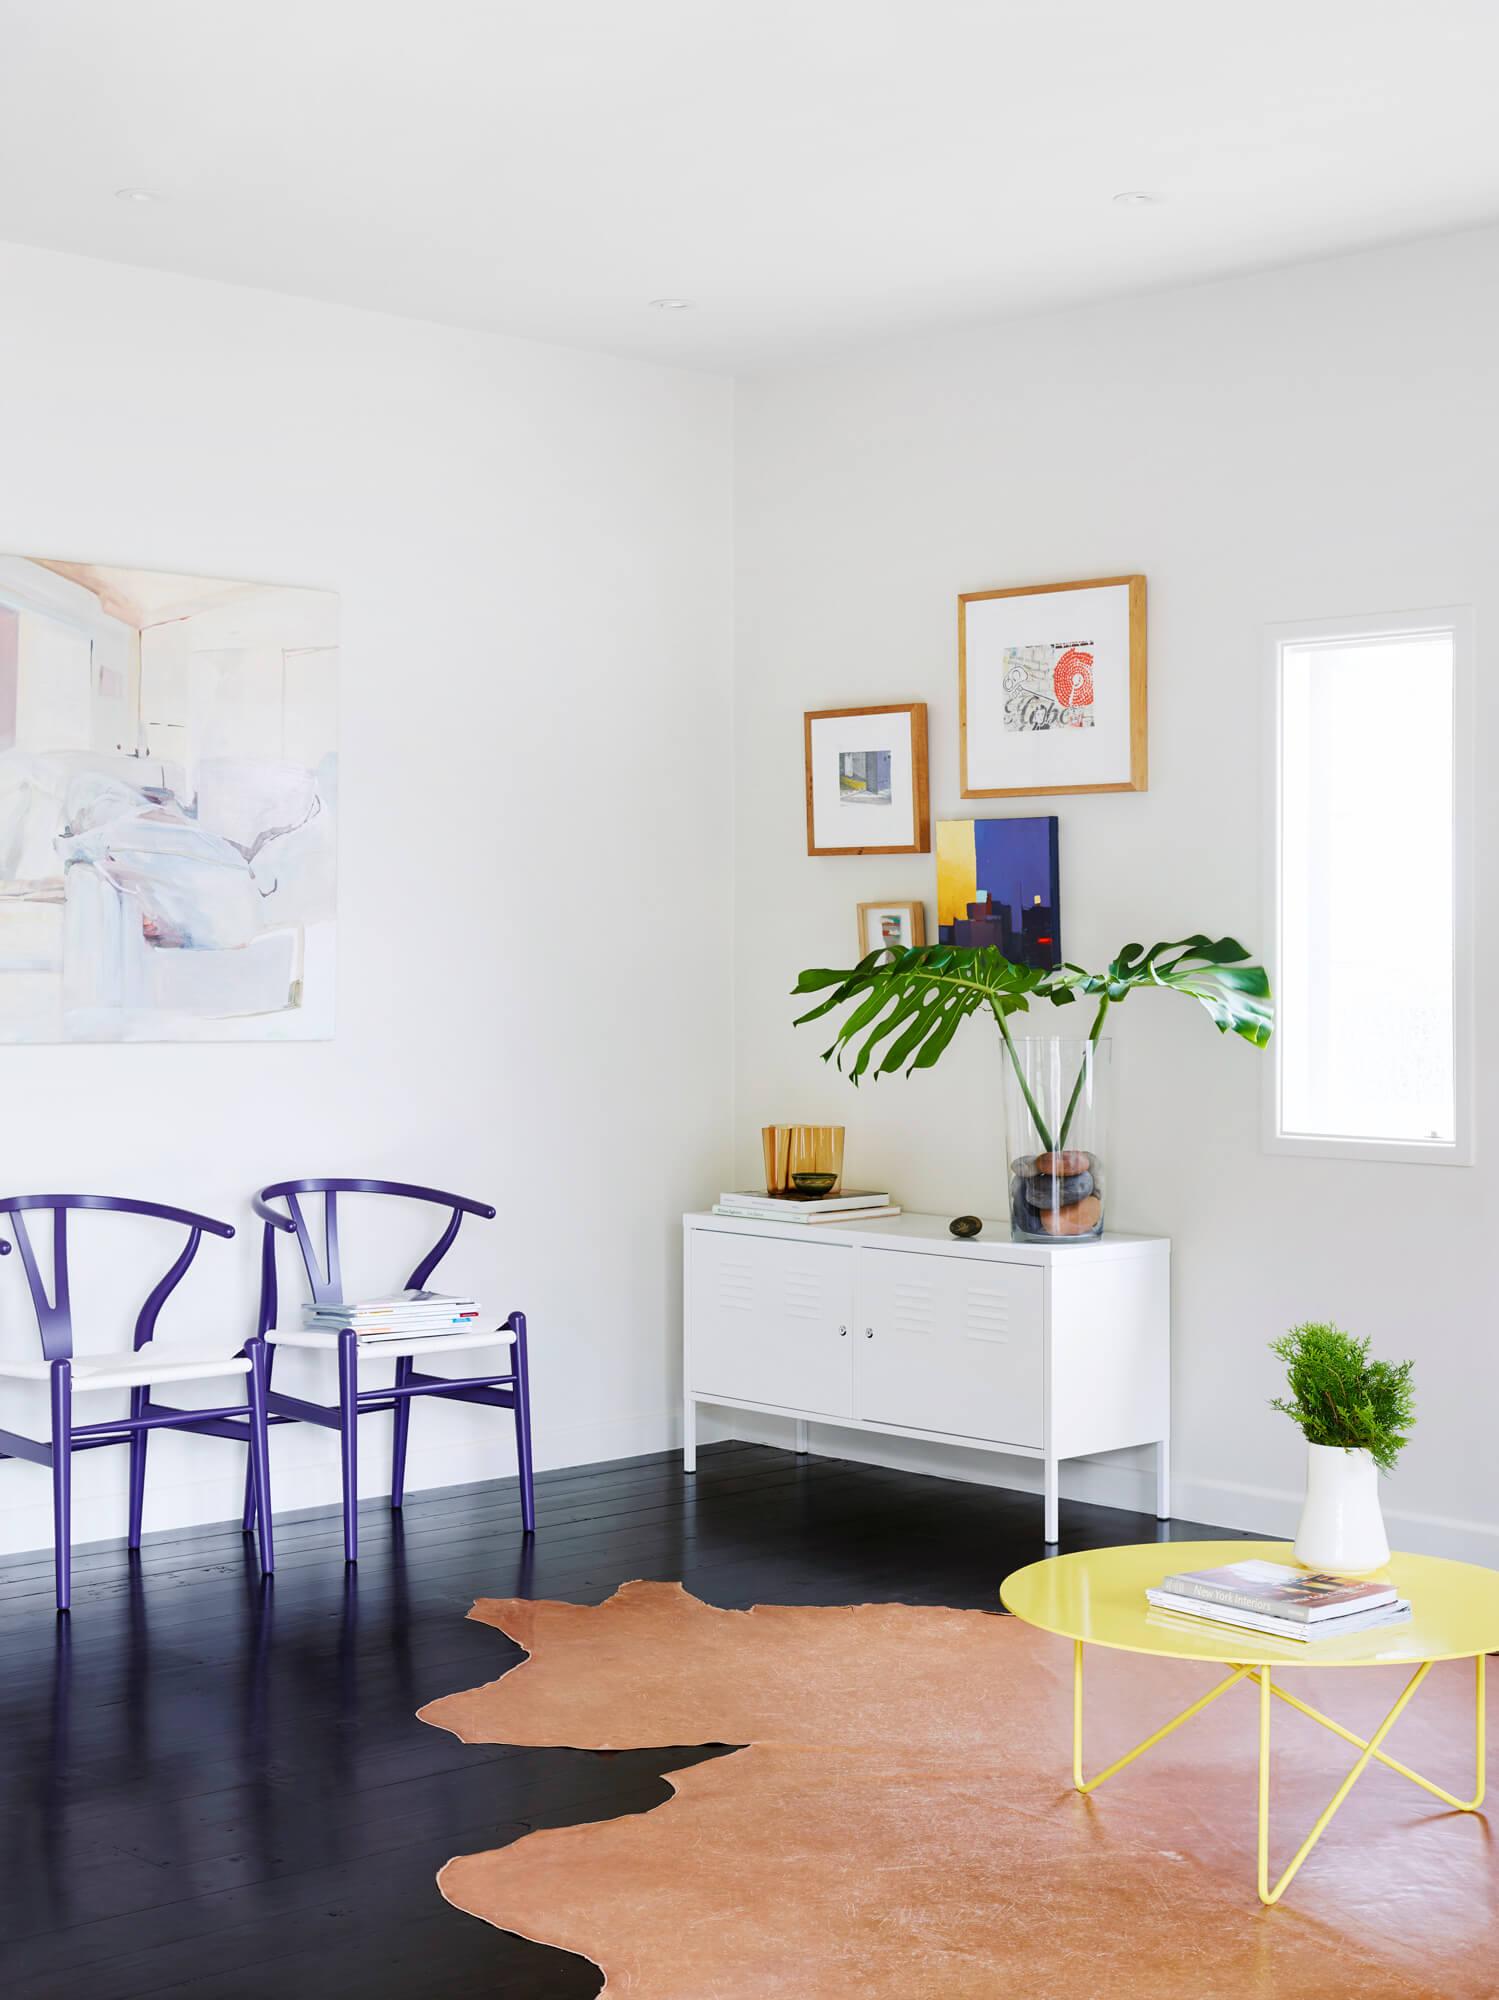 georgia-cannon-interior-designer-brisbane-project-m2-house-017070.jpg